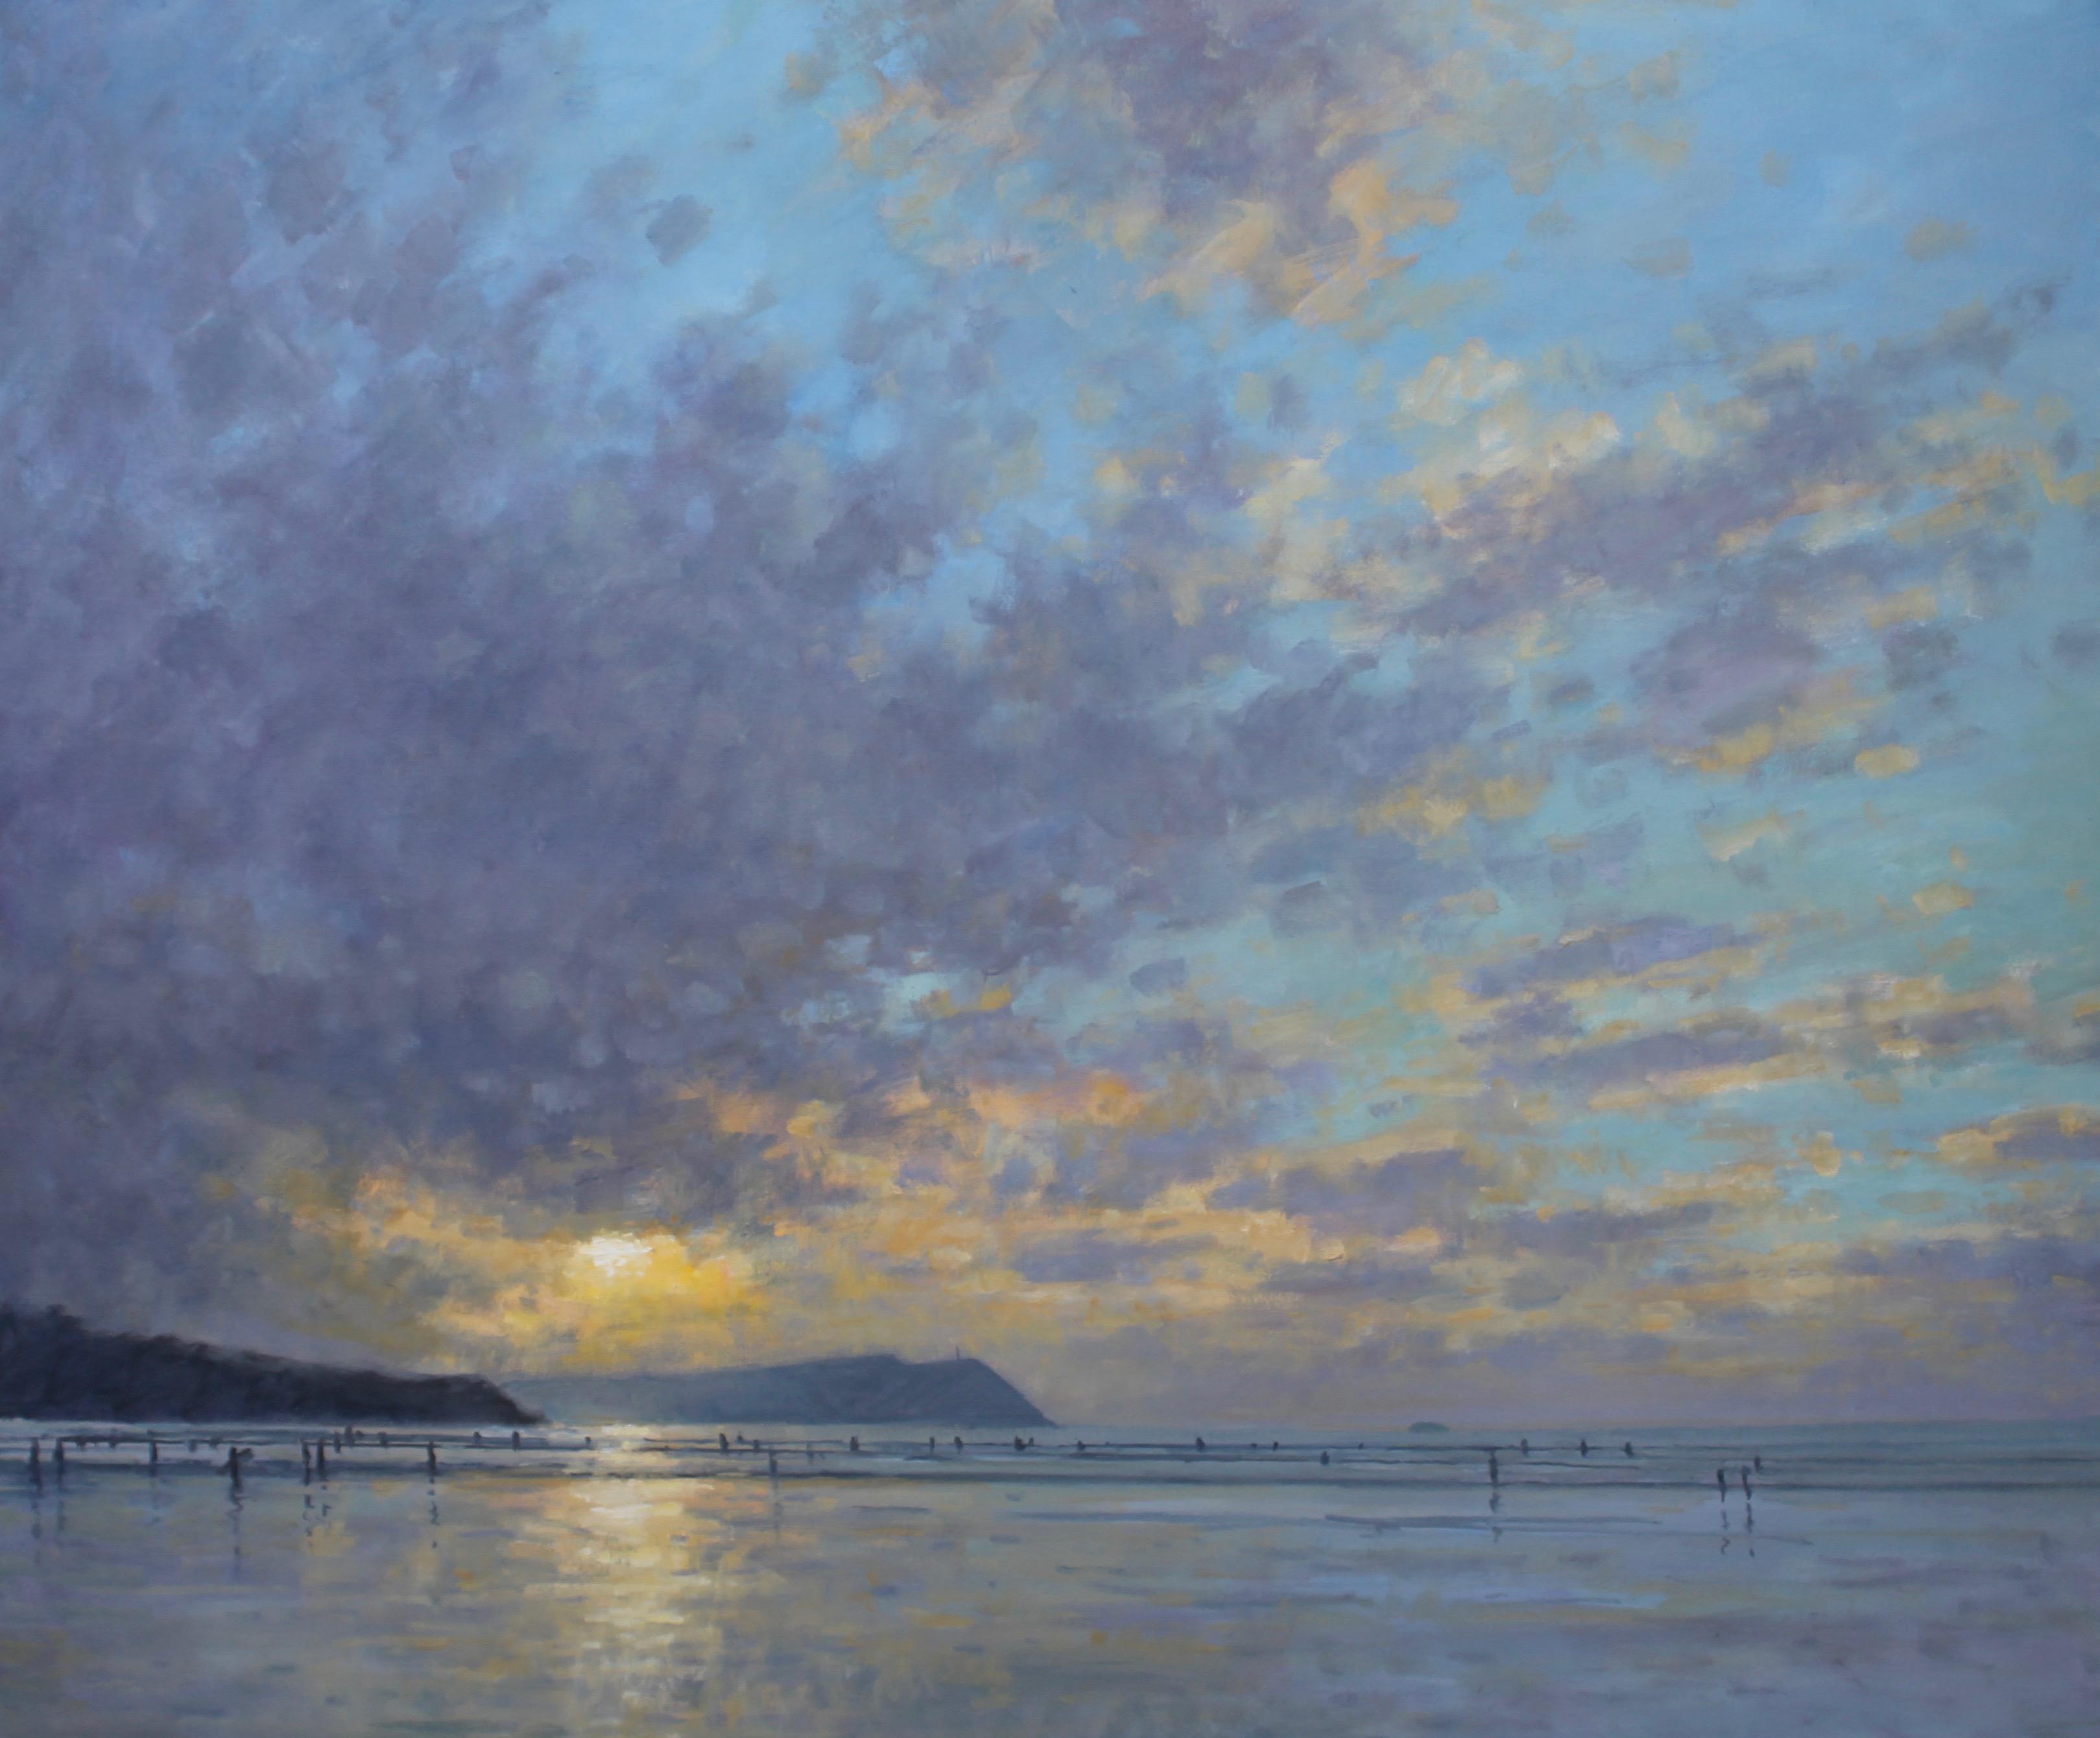 Evening light, Polzeath